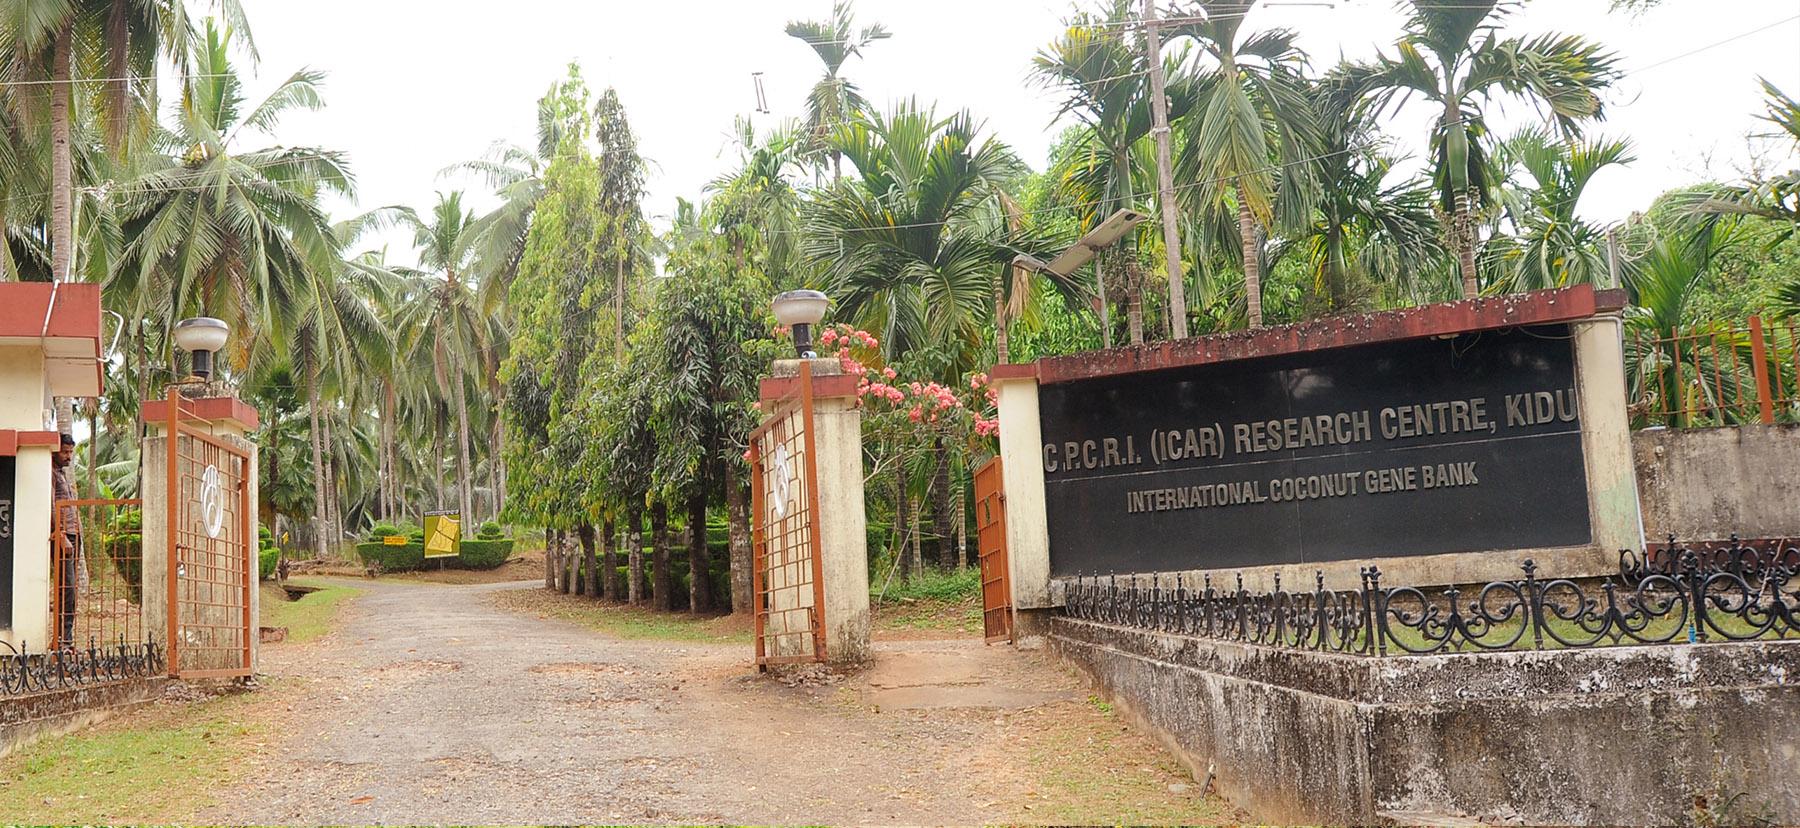 ICAR - CPCRI Research Centre, Kidu